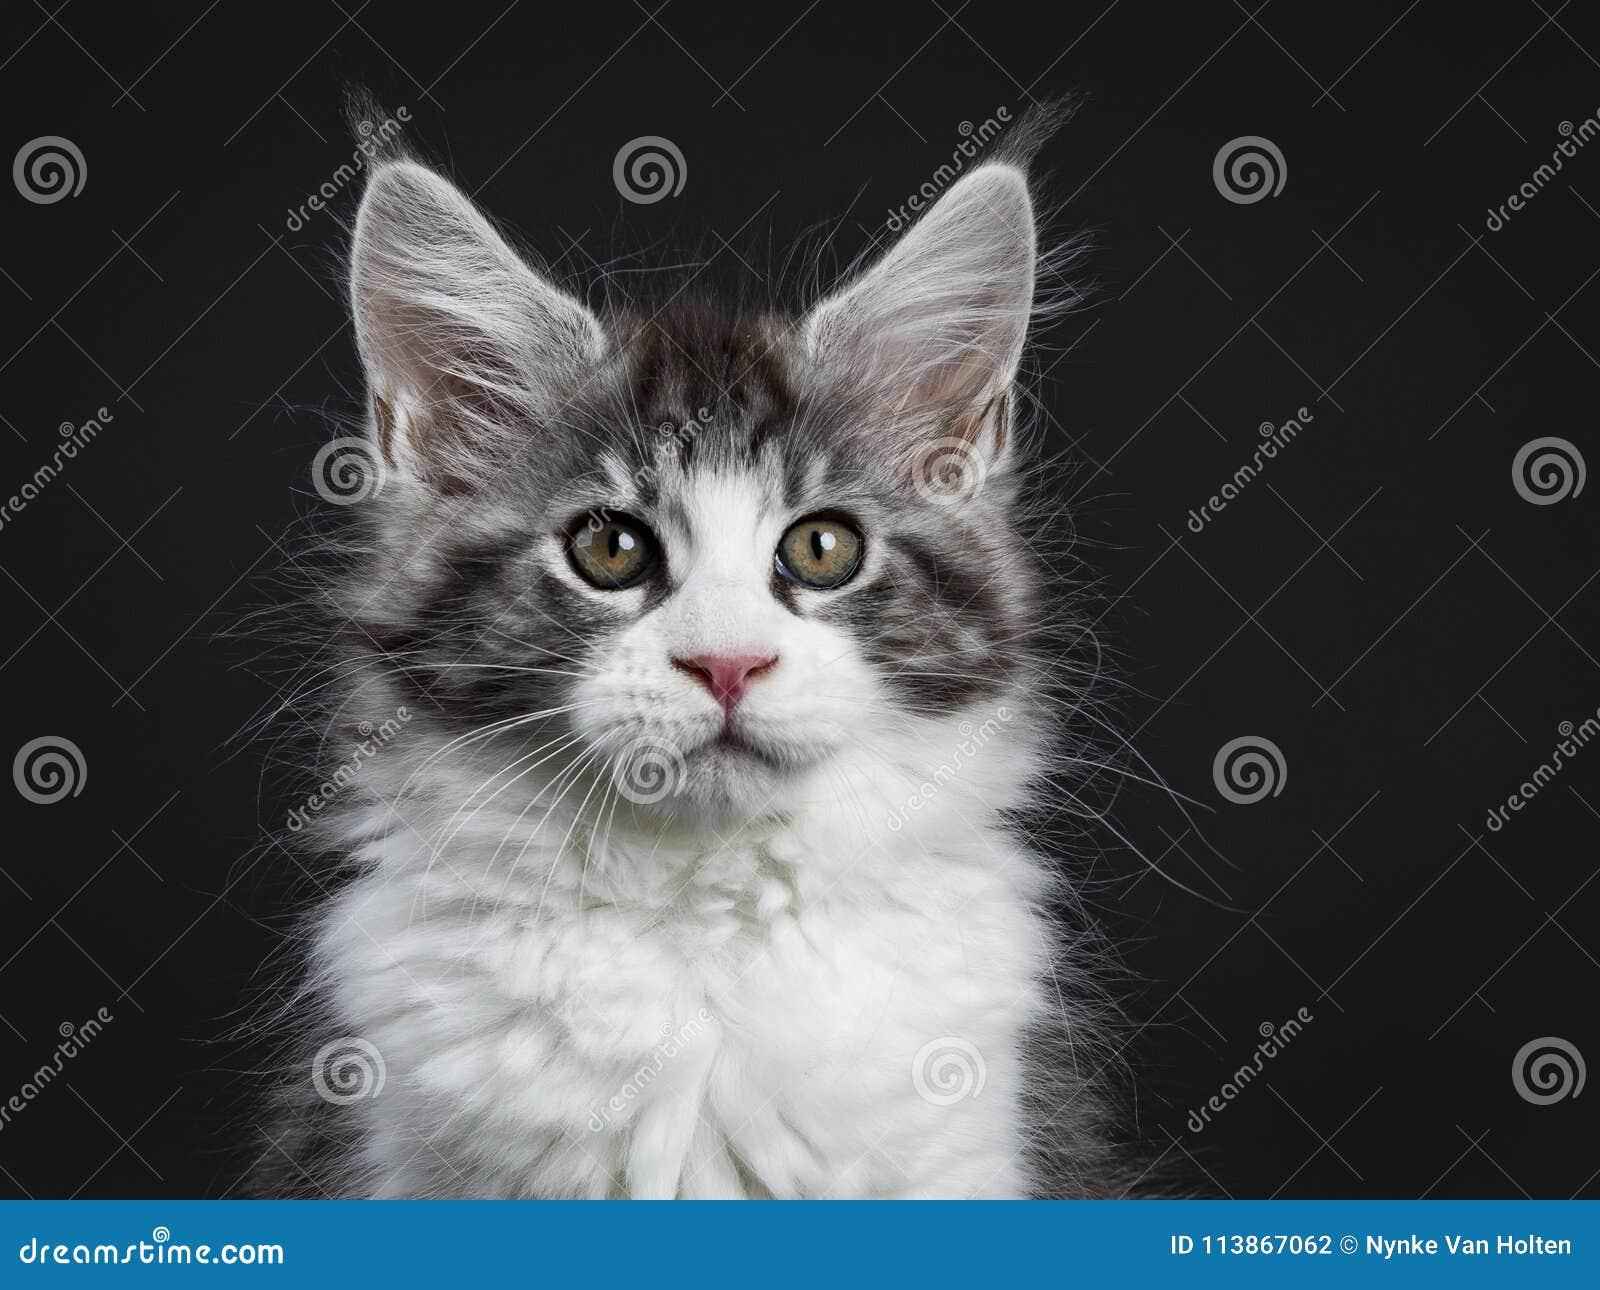 Tiro principal del gato atigrado negro hermoso con Maine Coon blanca